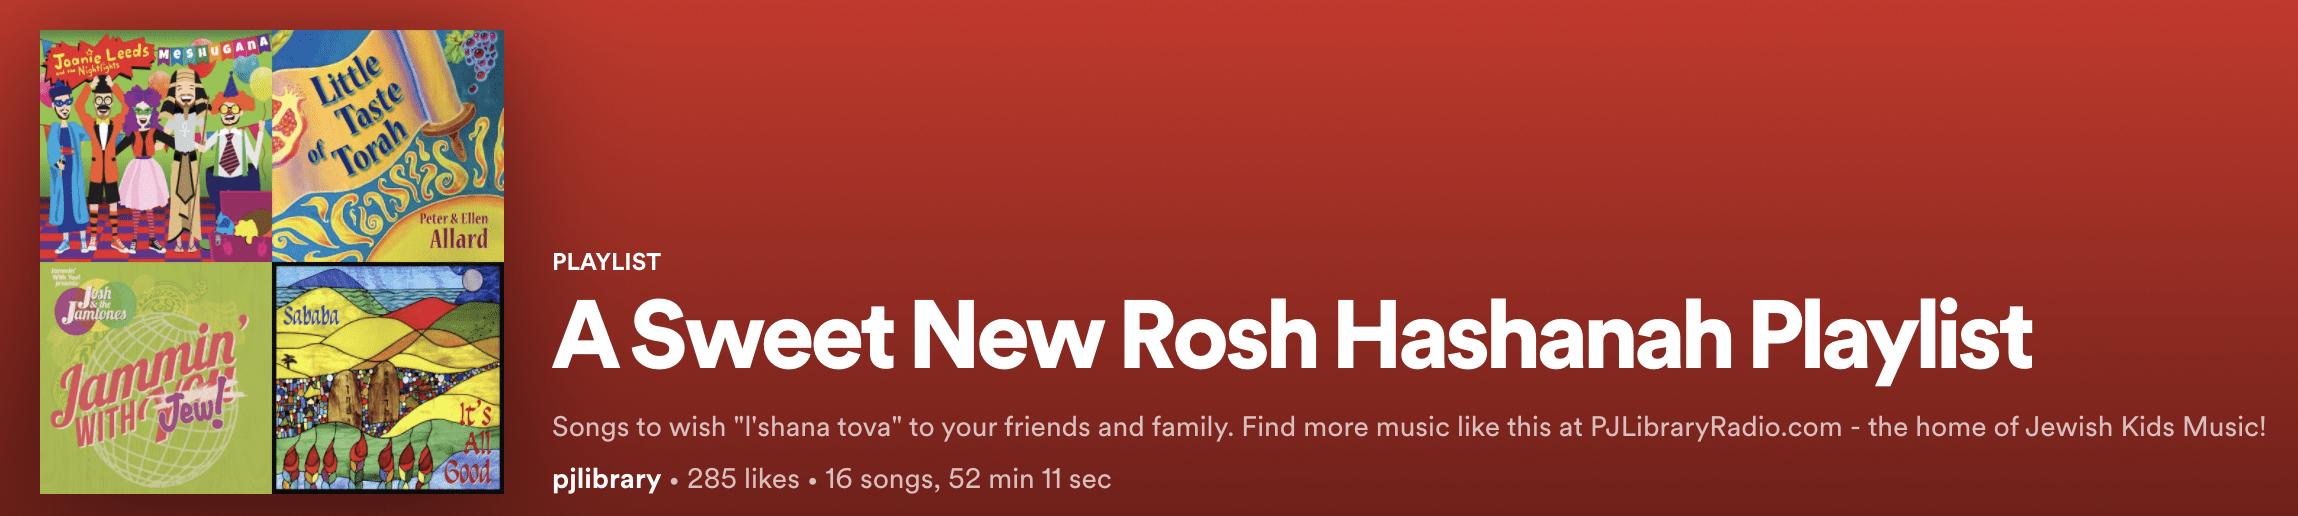 A sweet new Rosh Hashanah Playlist on spotify!